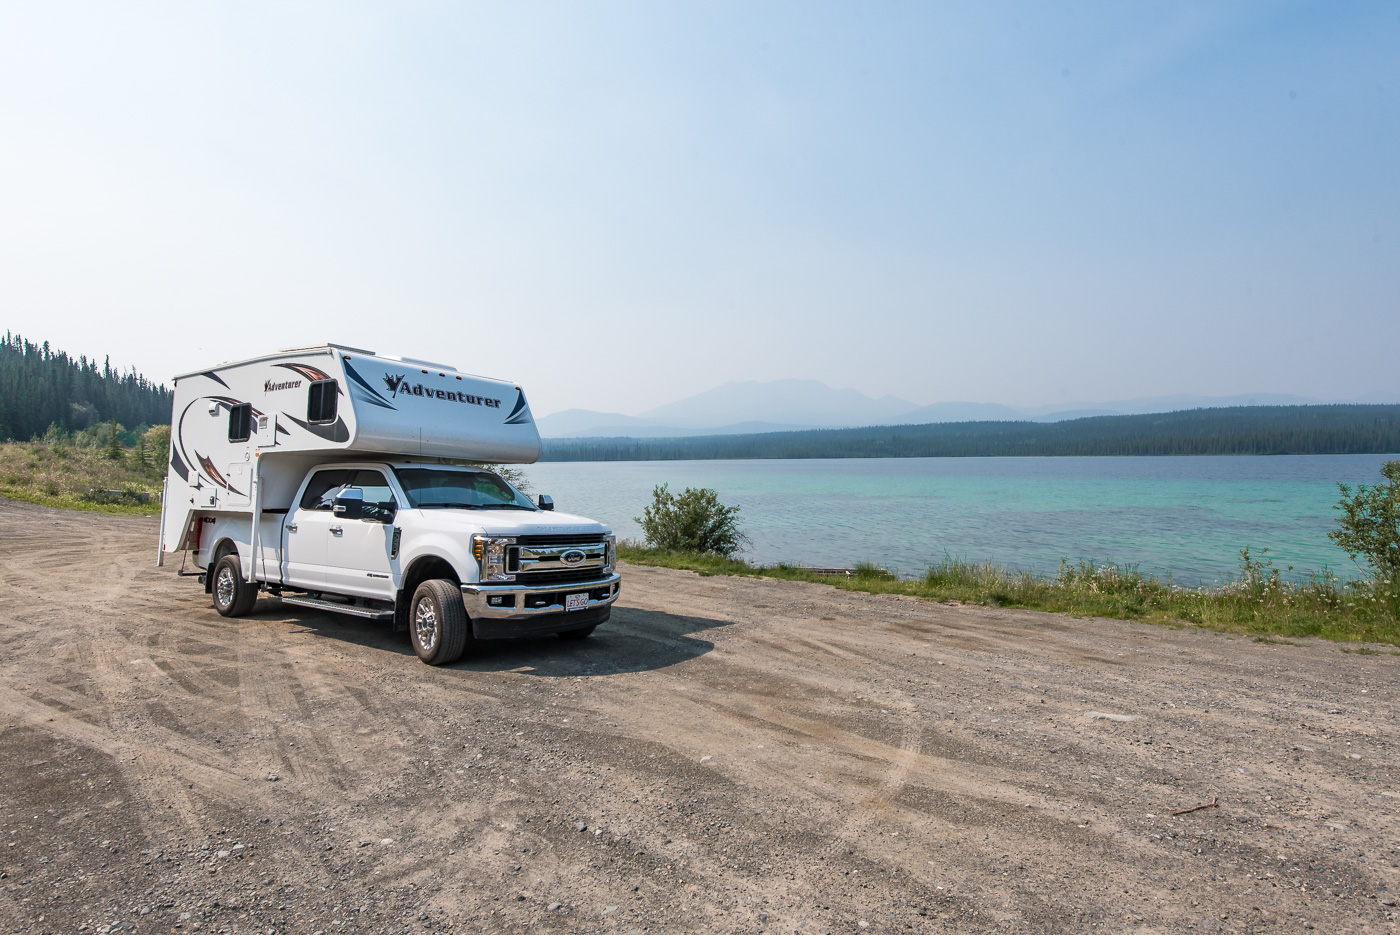 Yukon camper